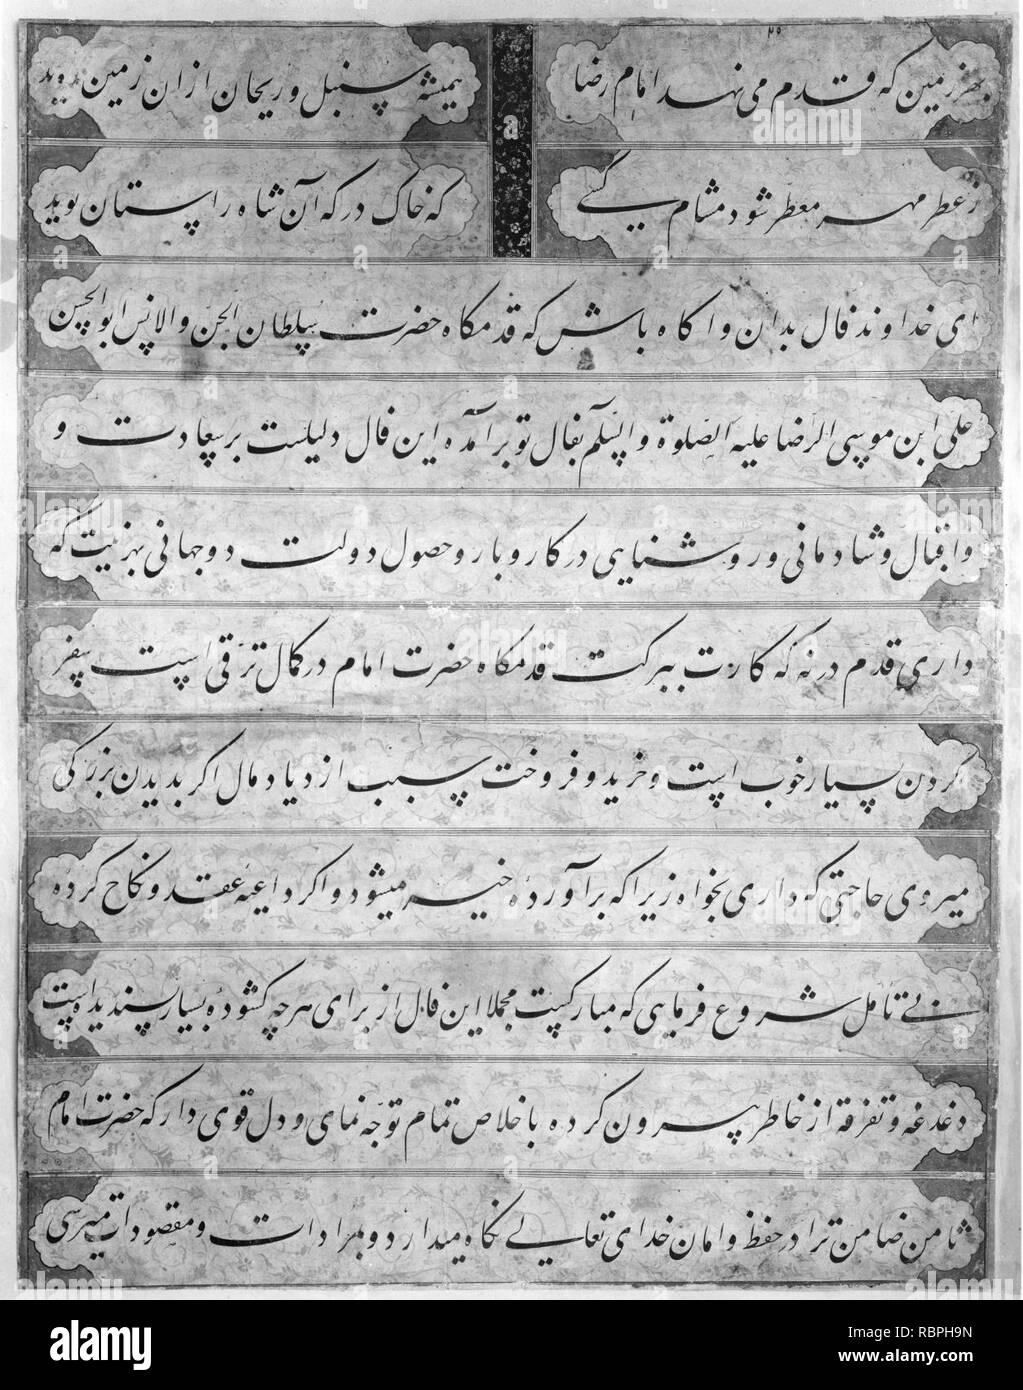 'Coffin of Imam 'Ali', Folio from a Falnama (The Book of Omens) of Ja'far al-Sadiq - Stock Image